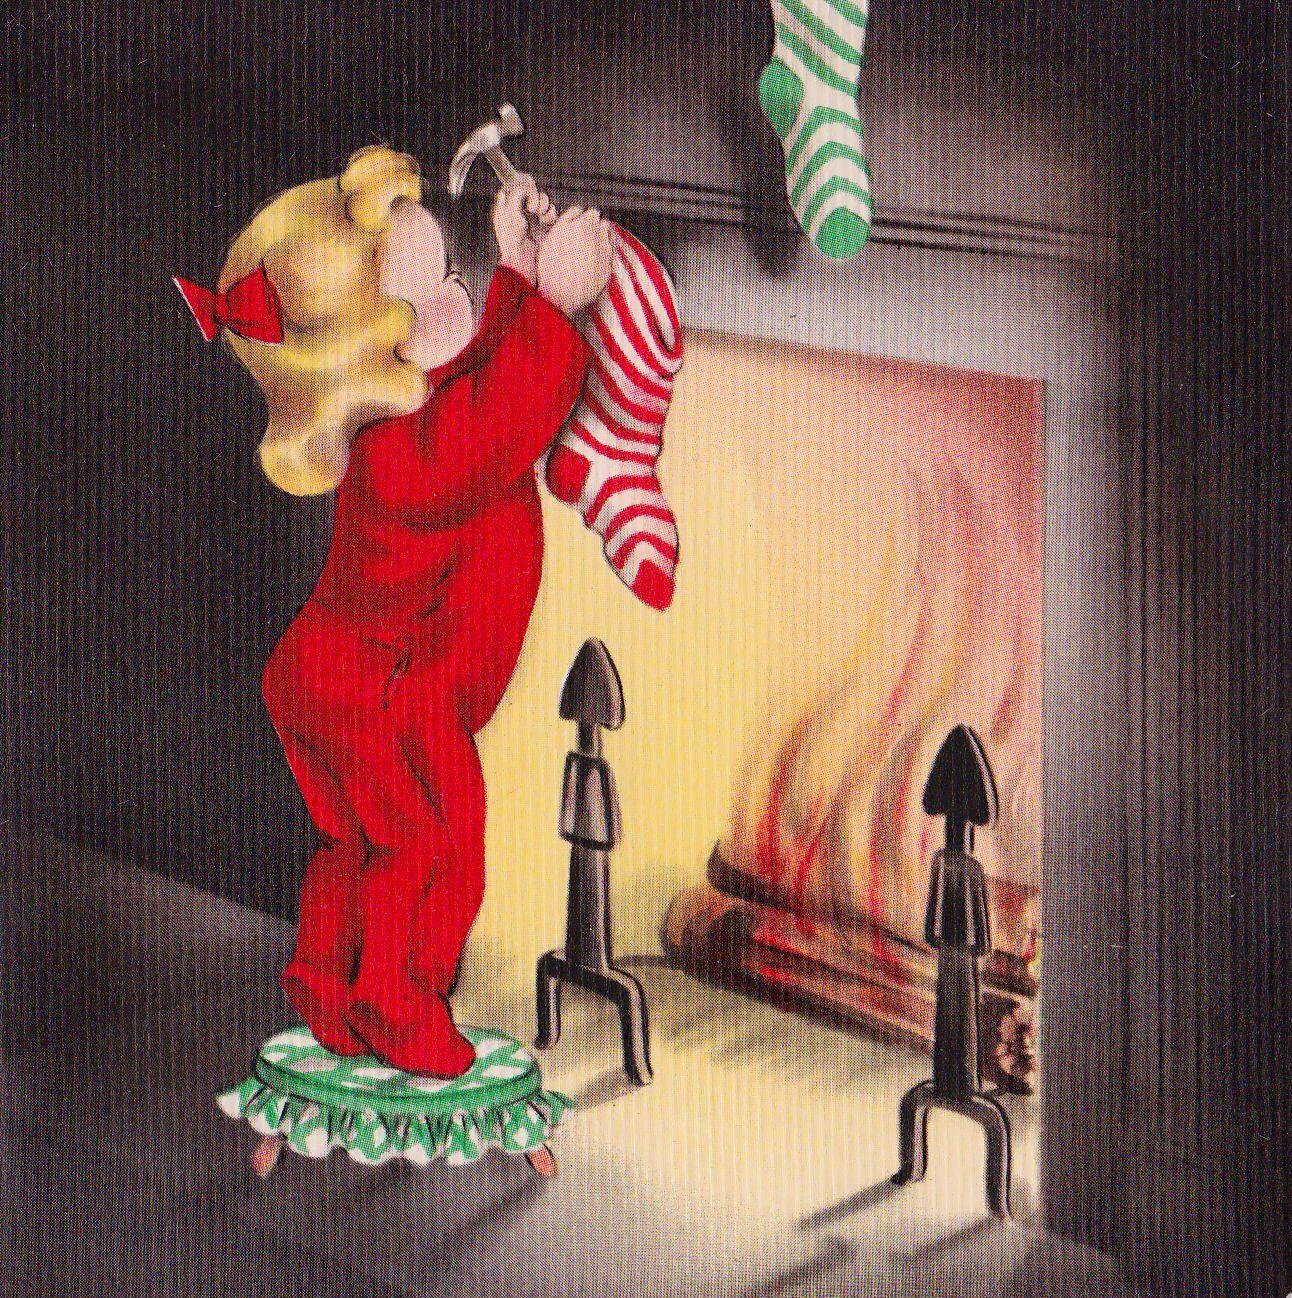 Hanging the Christmas stocking ~ 1941 Hallmark card